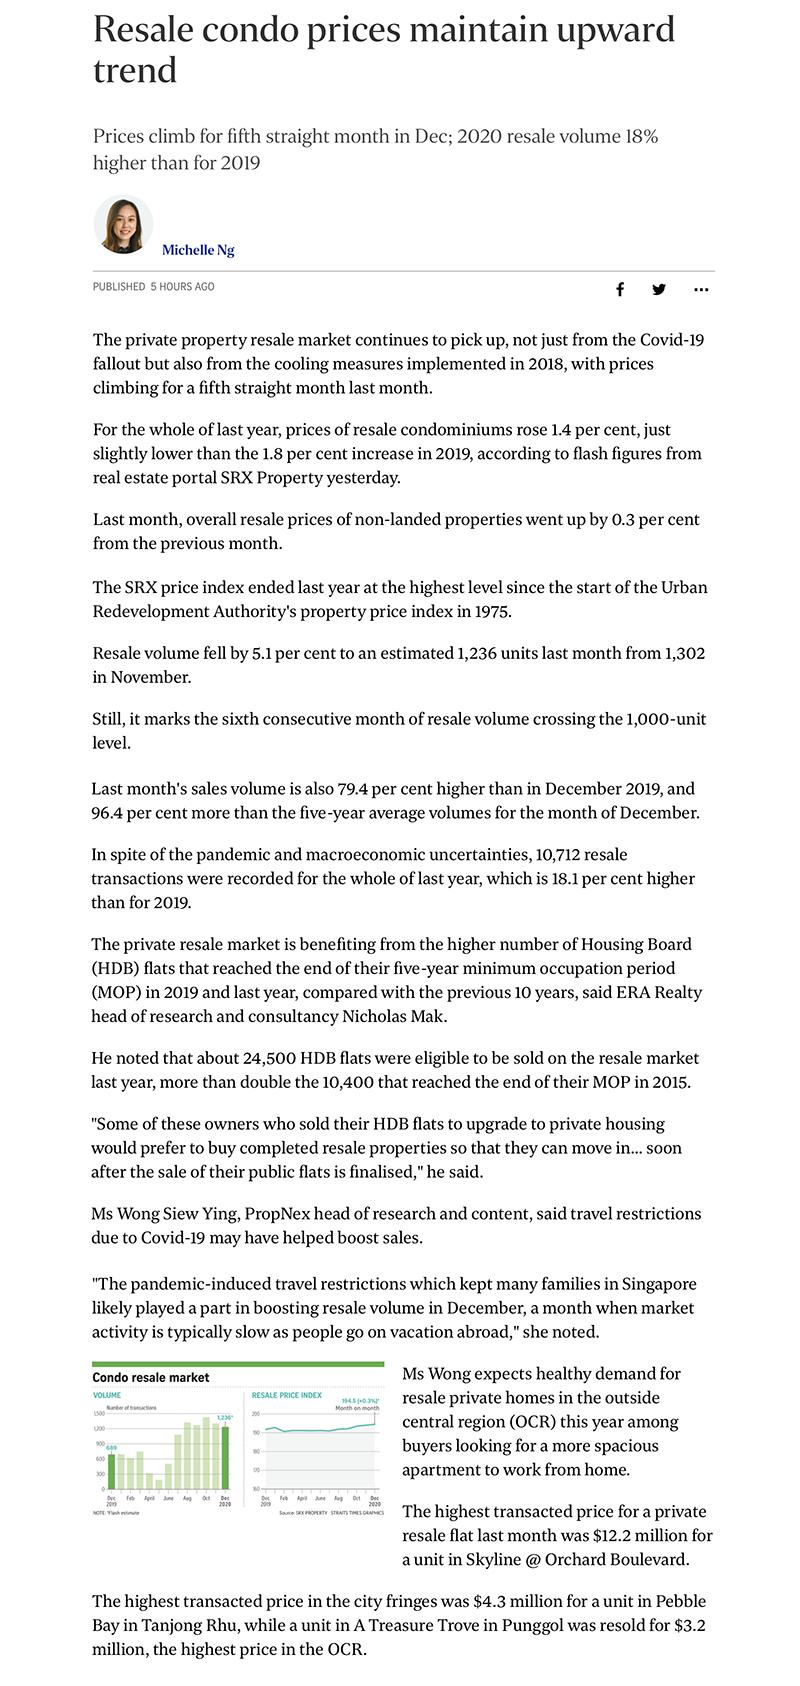 Pefect Ten - Resale condo prices maintain upward trend